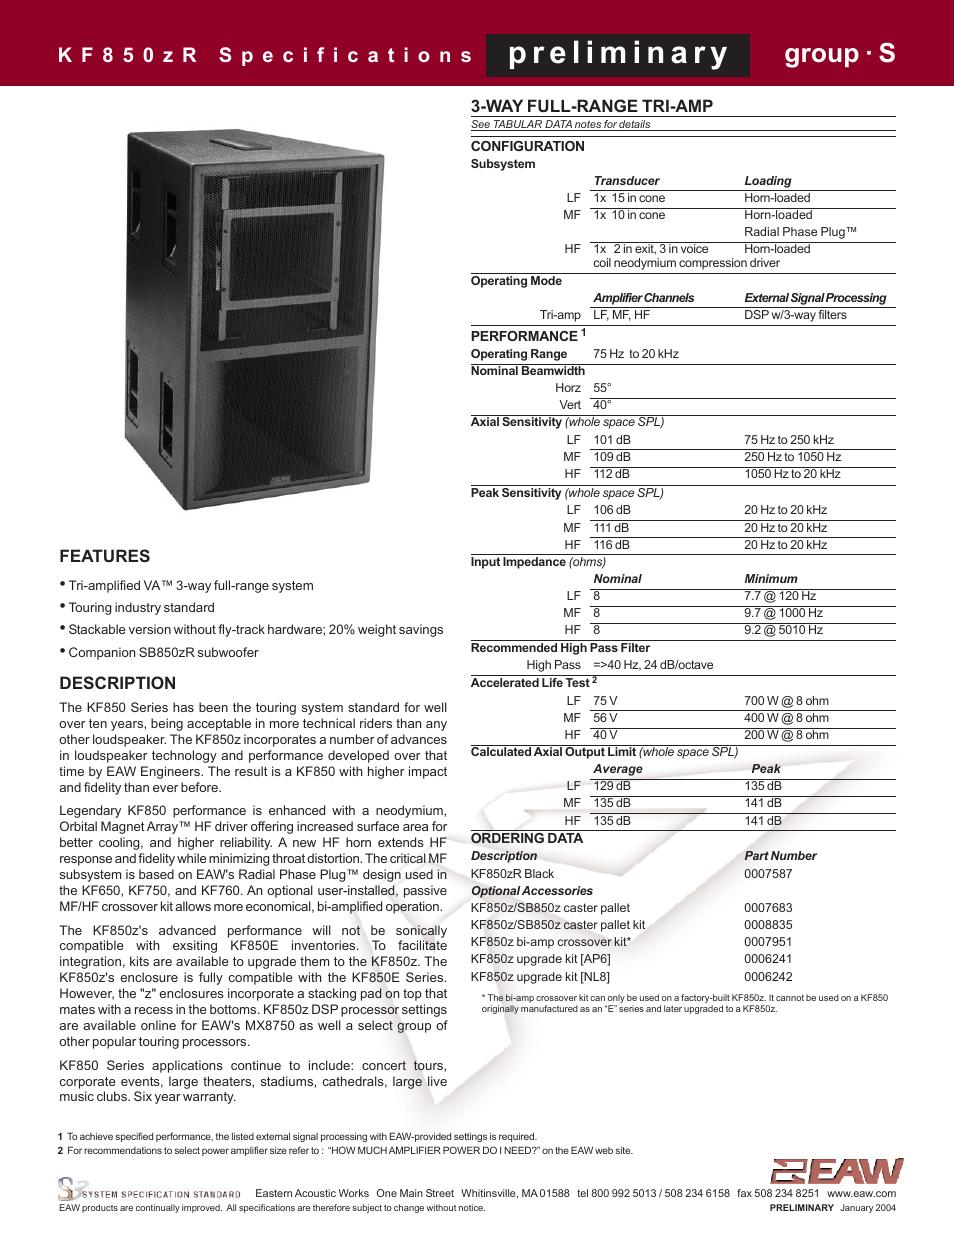 eaw kf850zr user manual 4 pages rh manualsdir com